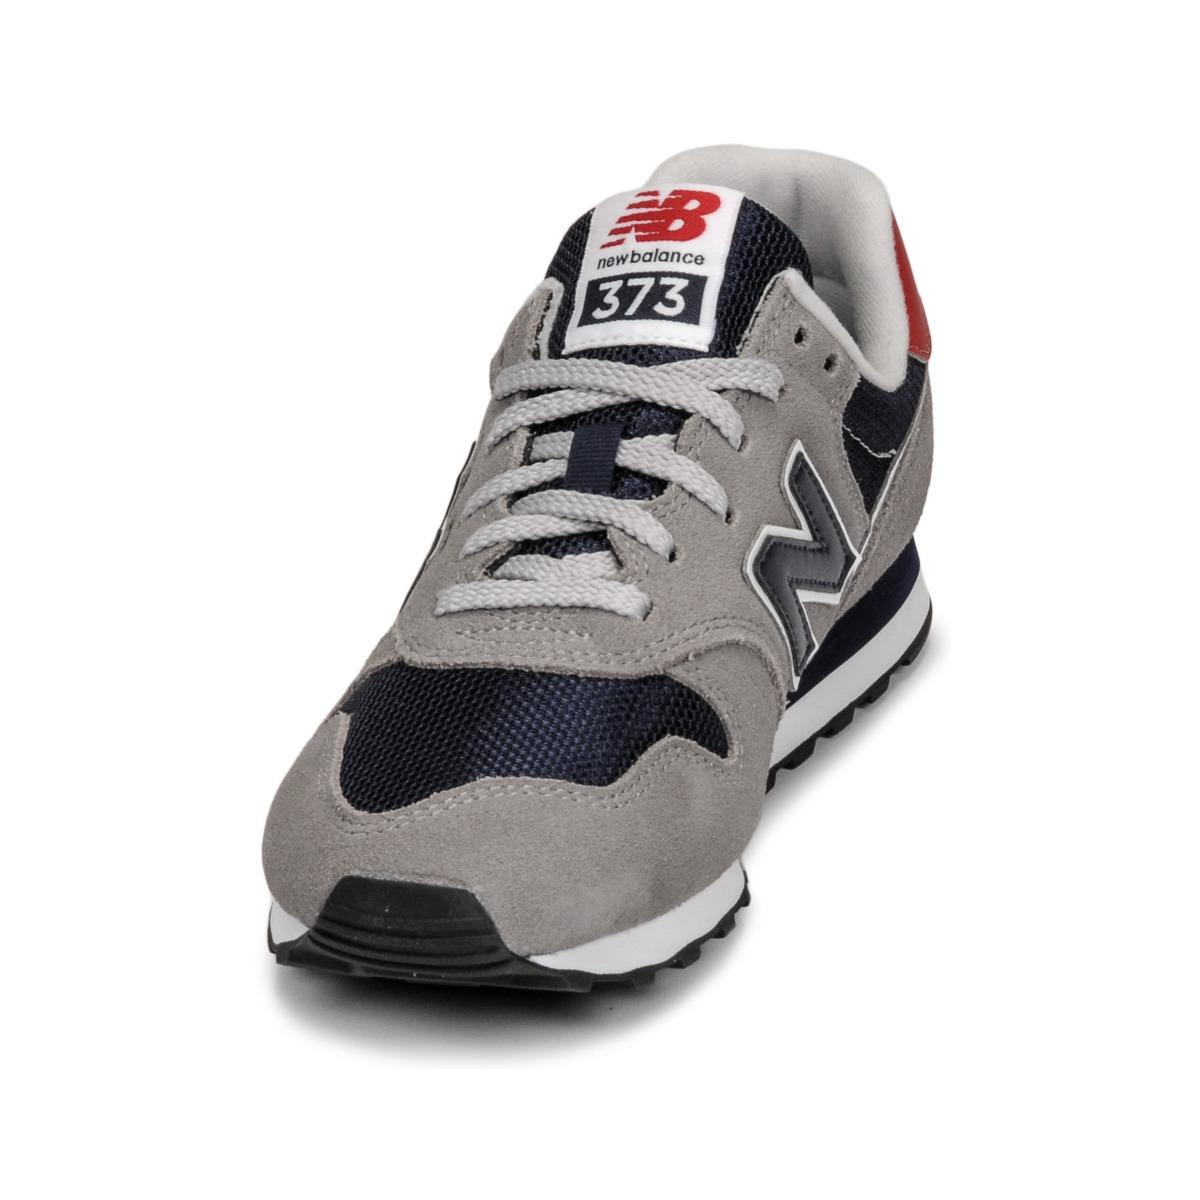 Sneakers uomo New Balance 373